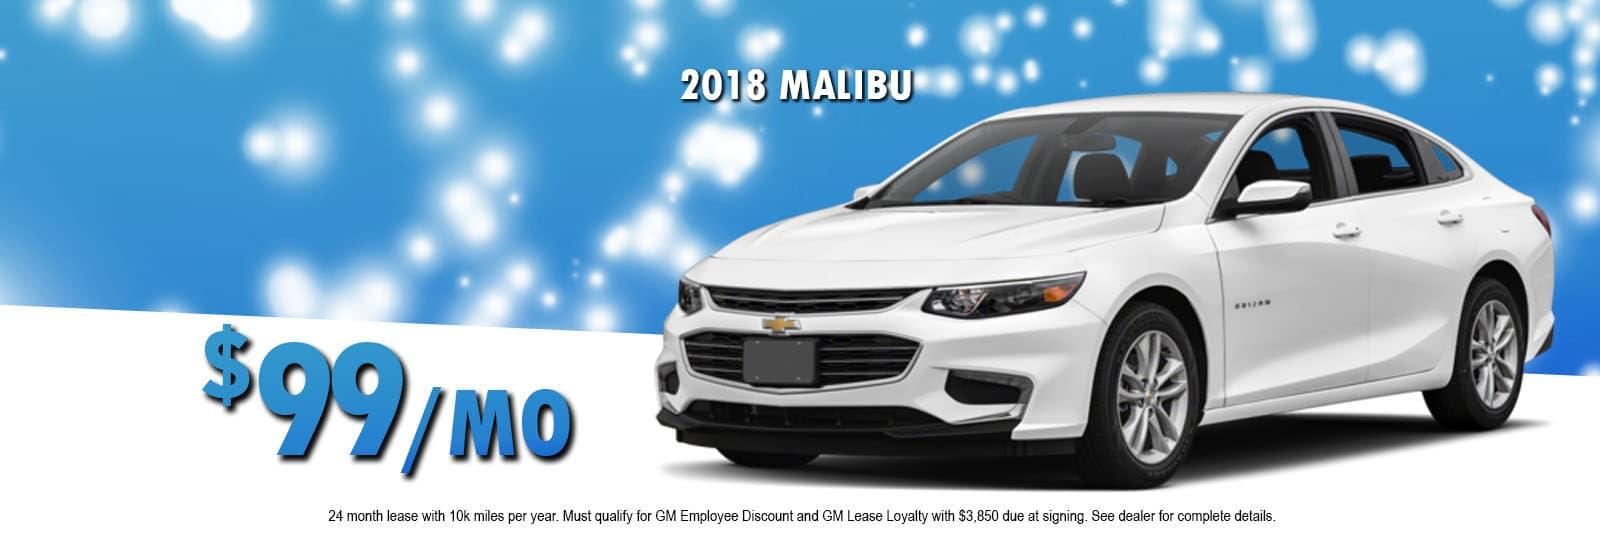 Ray Skillman Discount Chevrolet Indianapolis Indiana - Chevrolet dealerships indianapolis